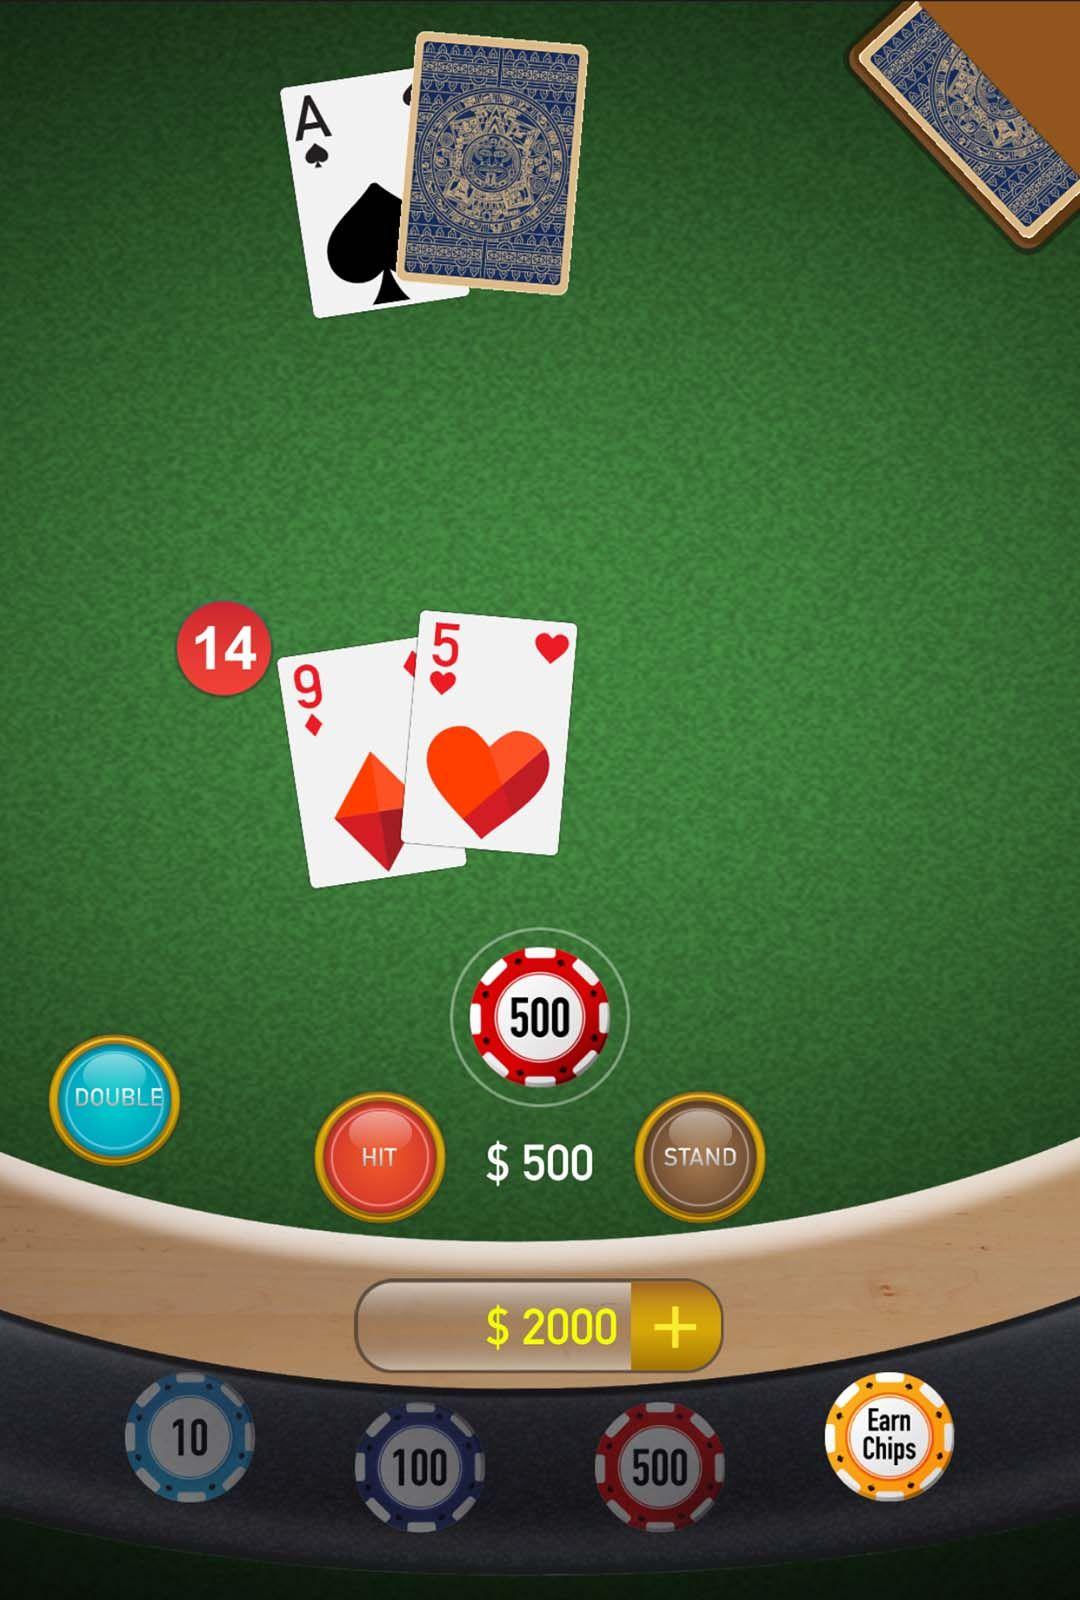 Palms 5 dollar blackjack